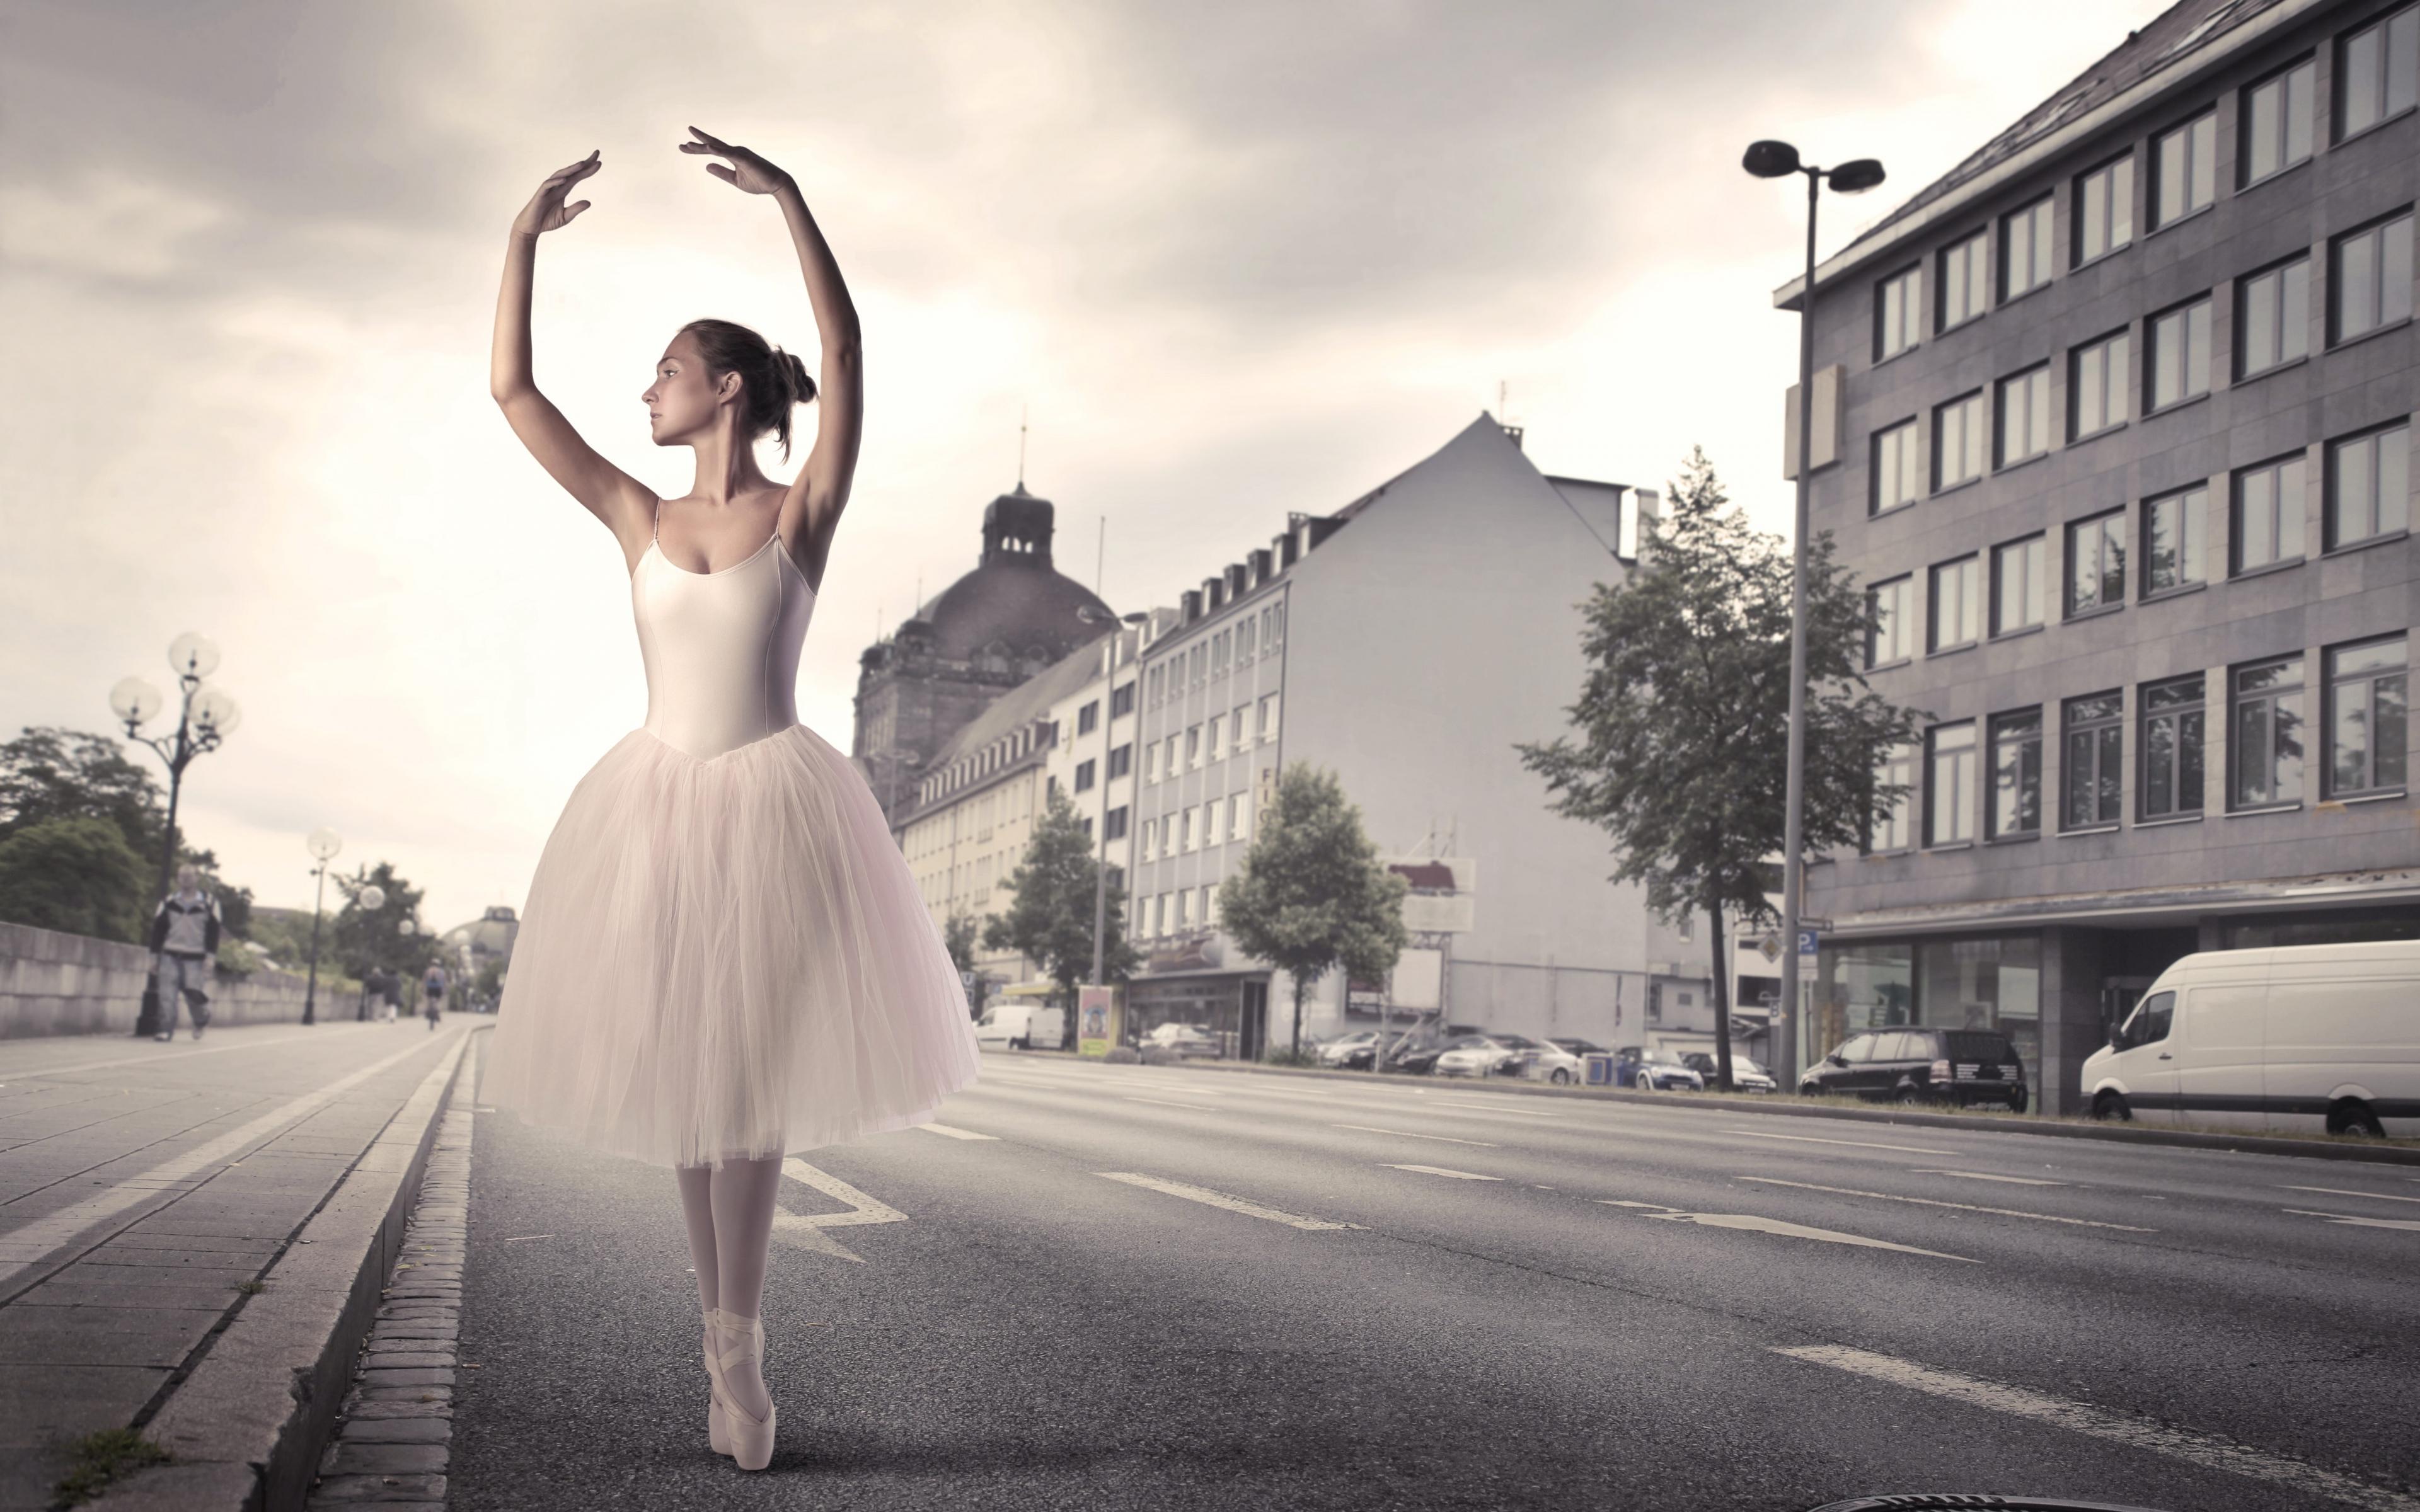 ballerine-mince-danseuse